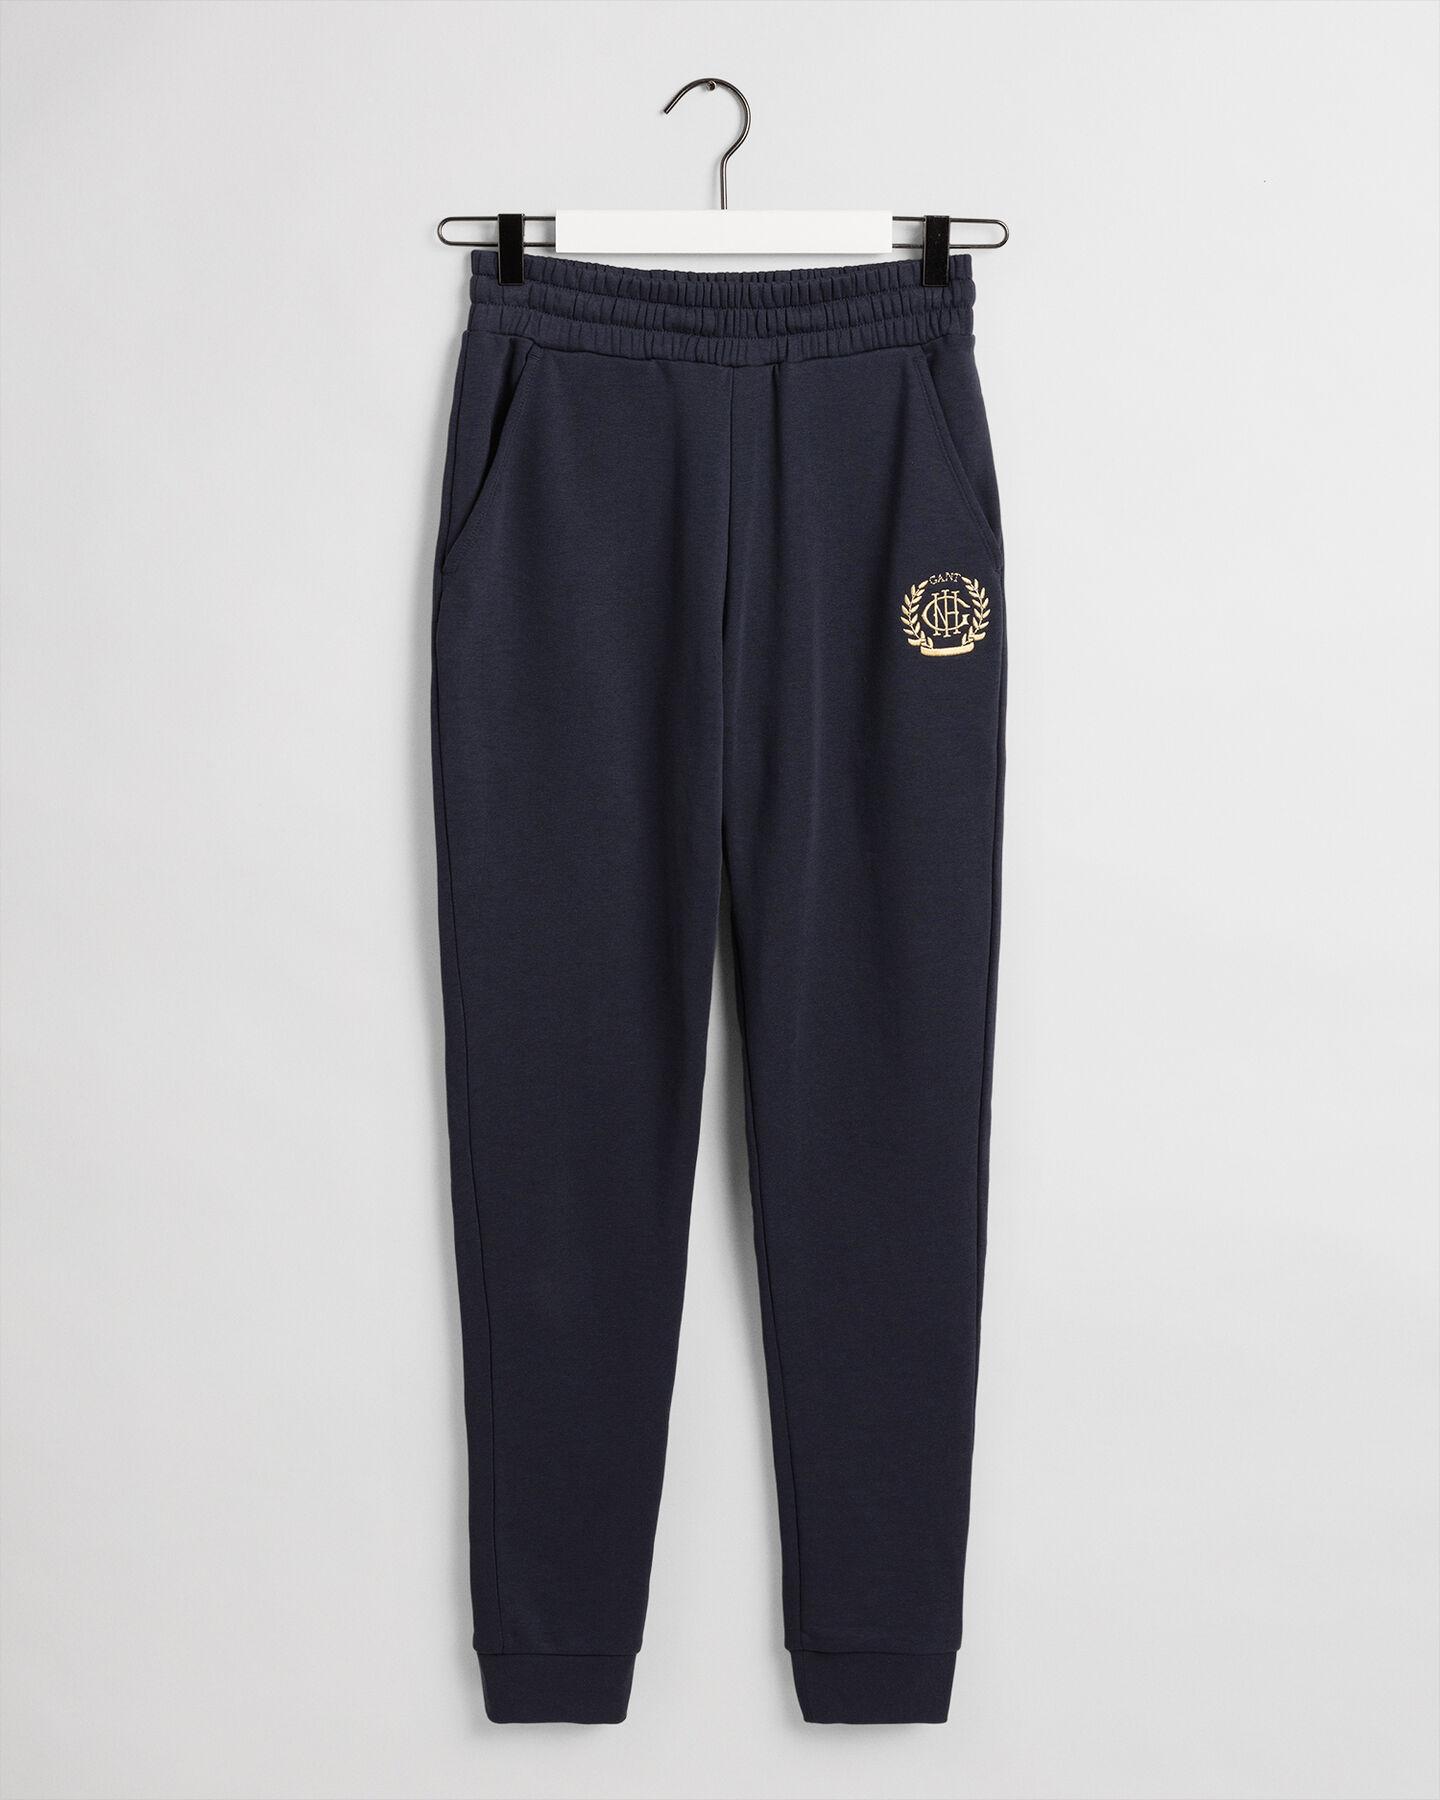 Teen Girls Monogram sweatpants